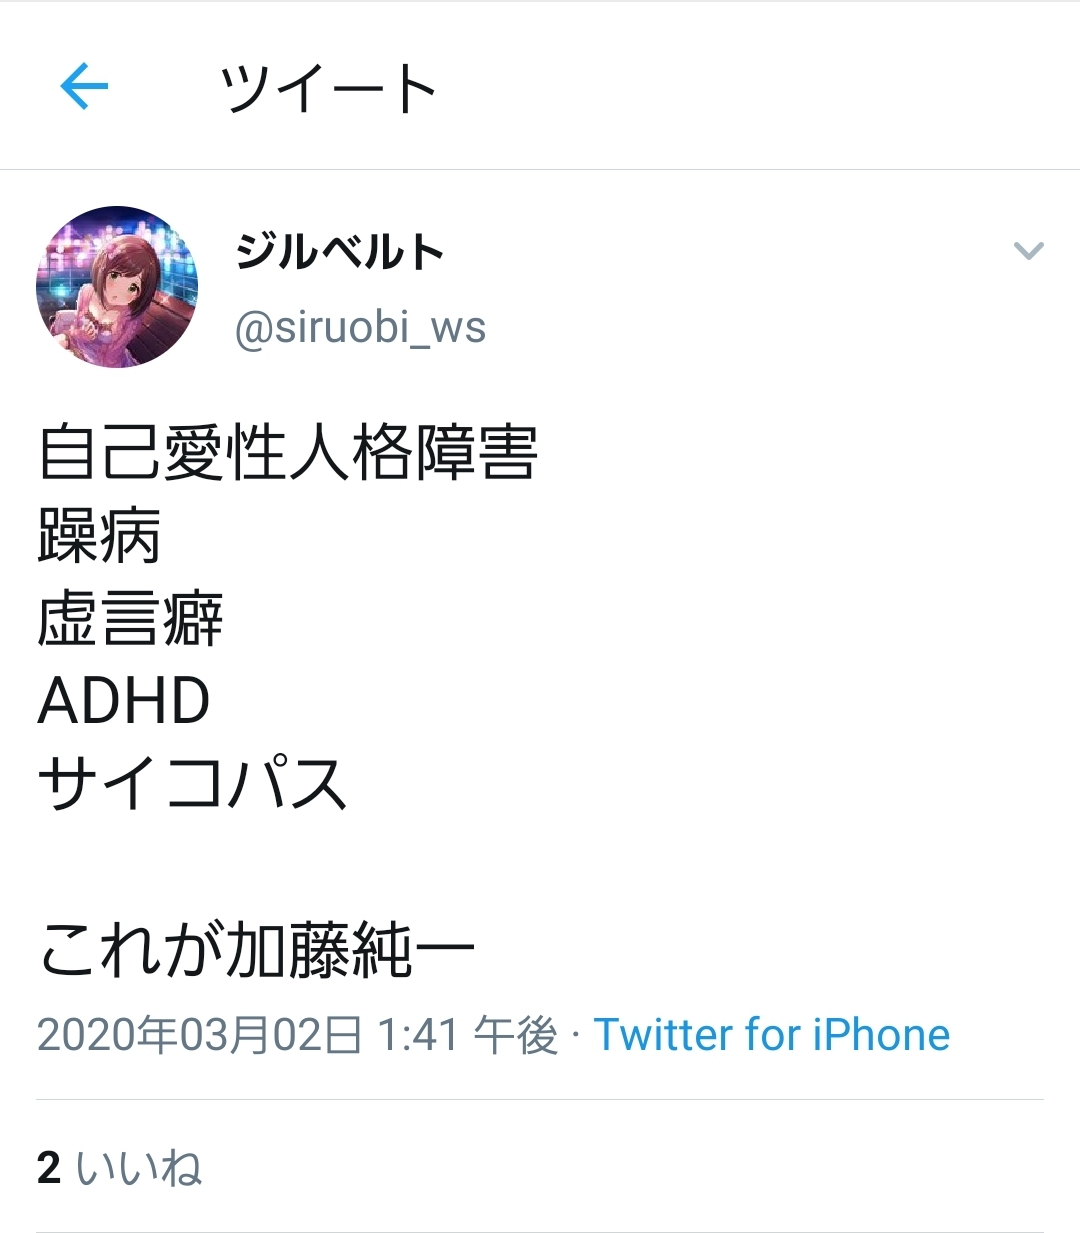 fFwP69O - 【悲報】加藤鈍一さん、食事会ドタキャンから怒涛の11時間連続配信